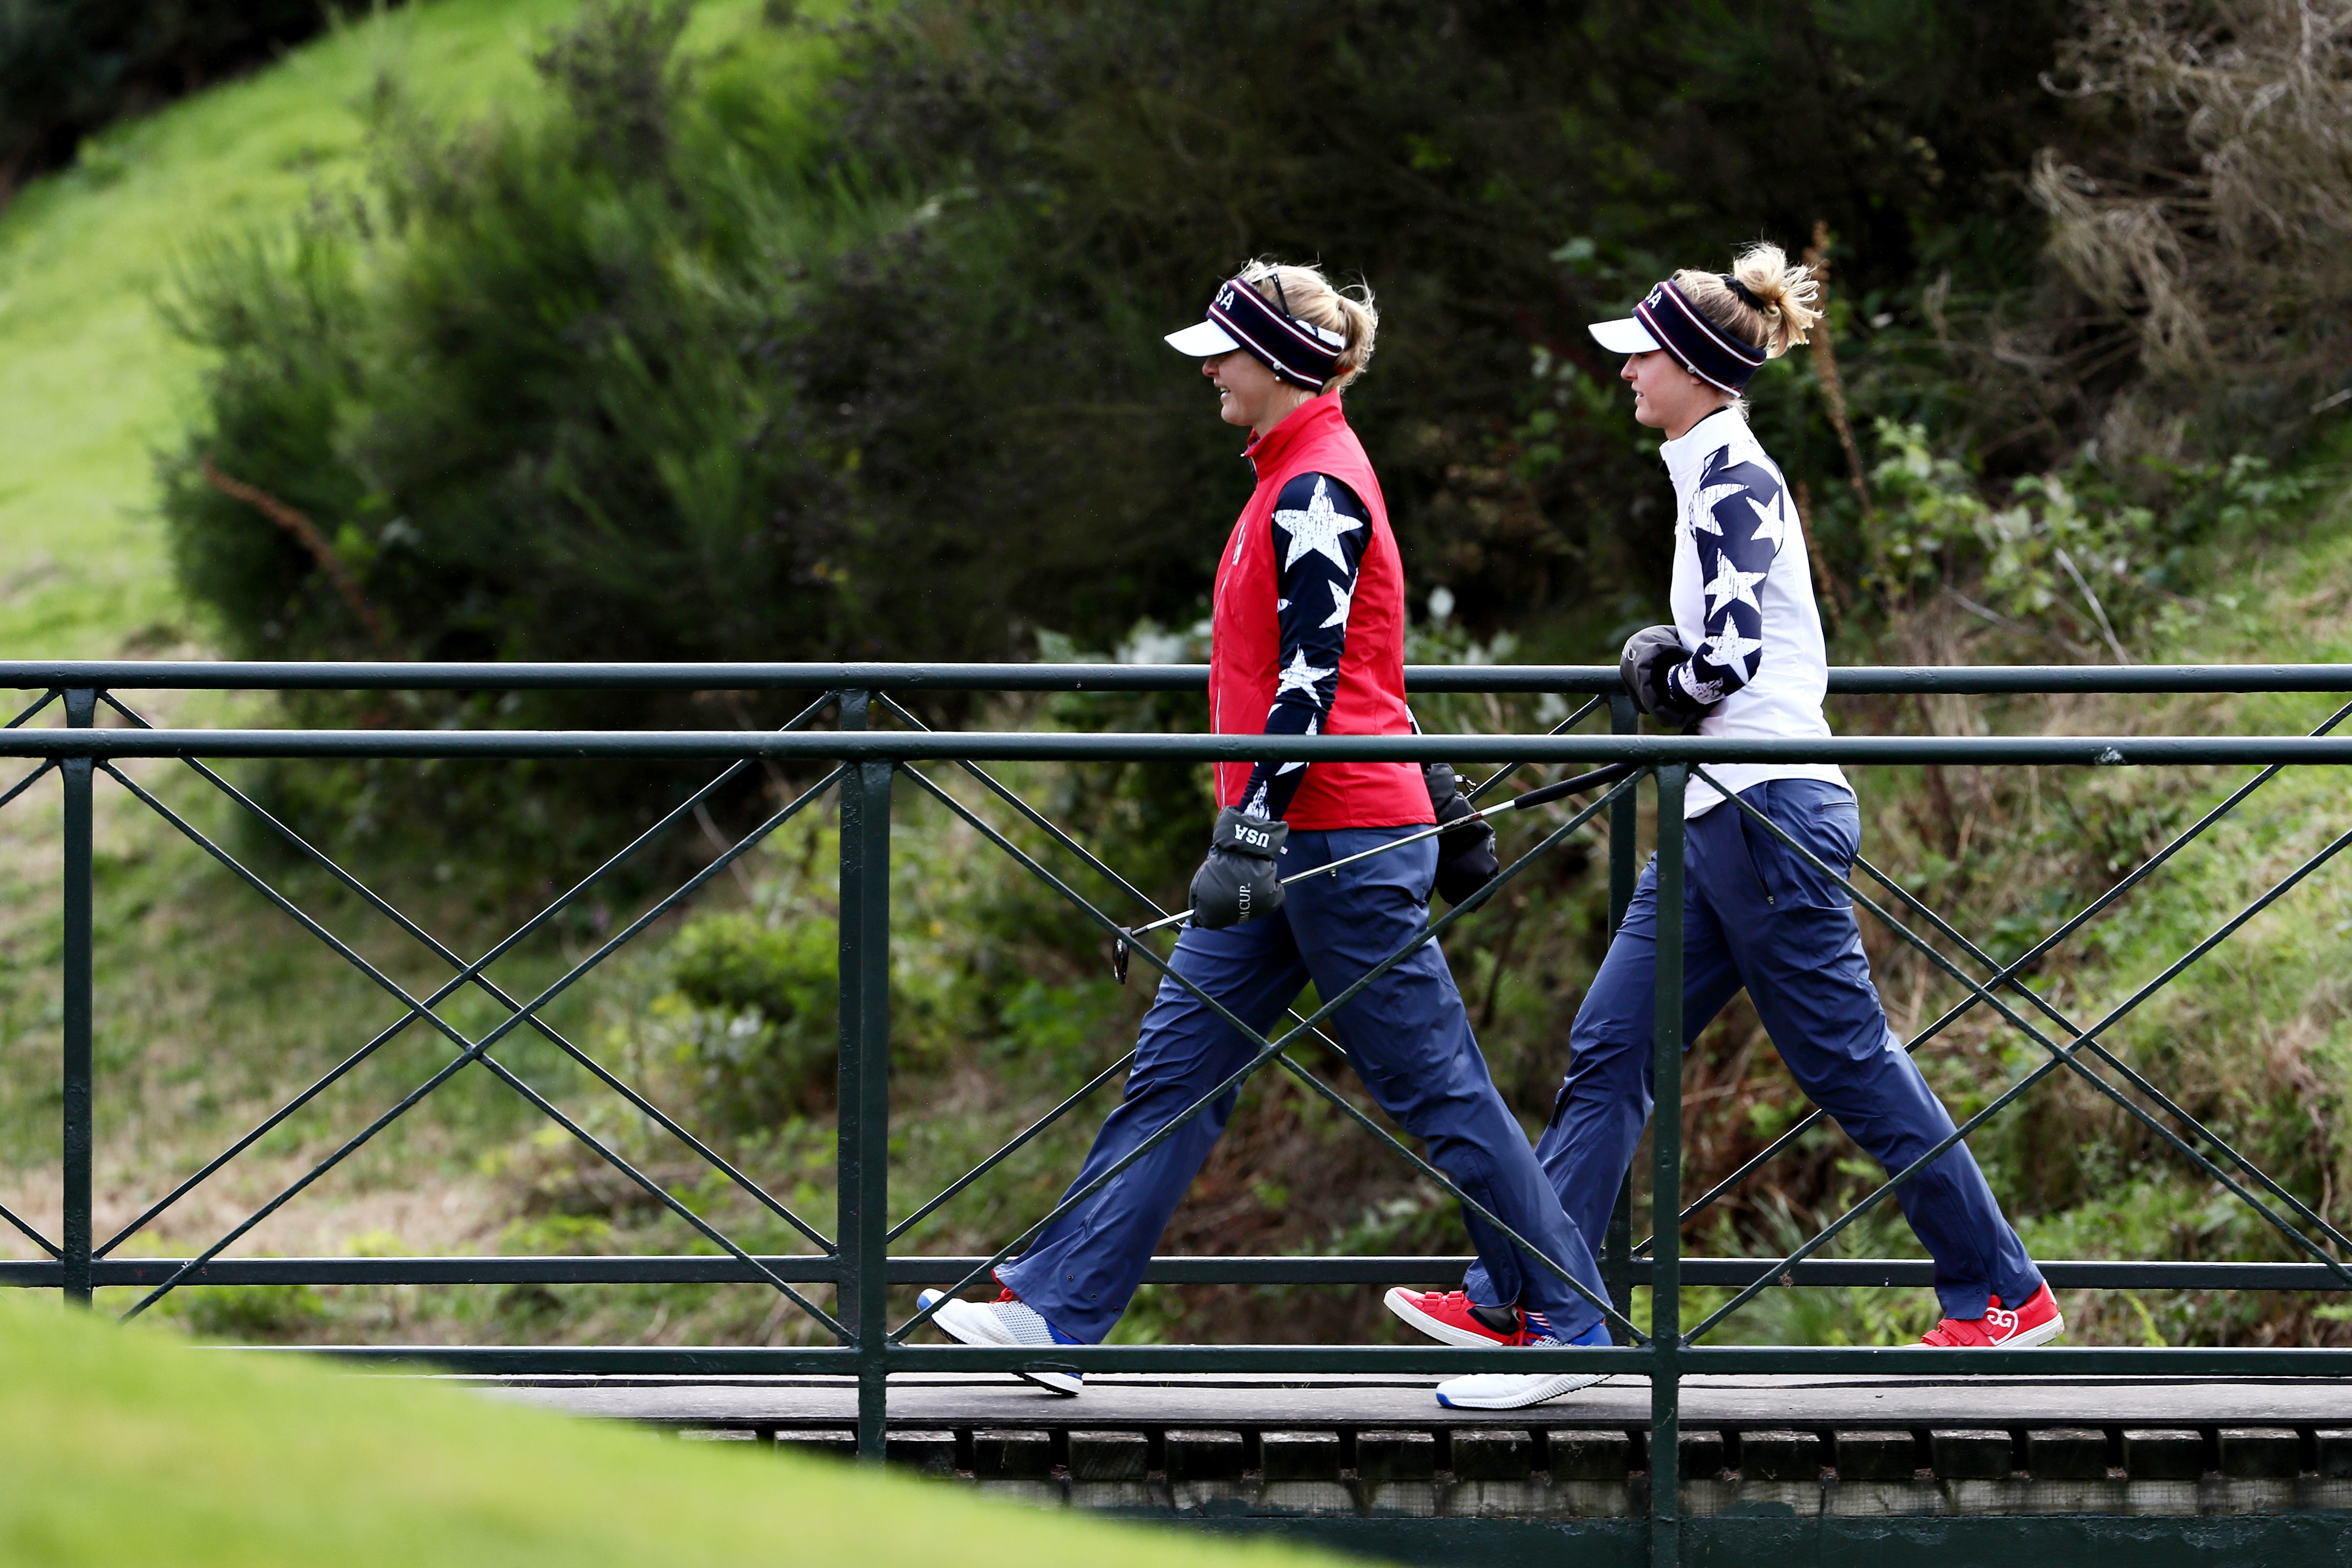 Jessica and Nelly Korda